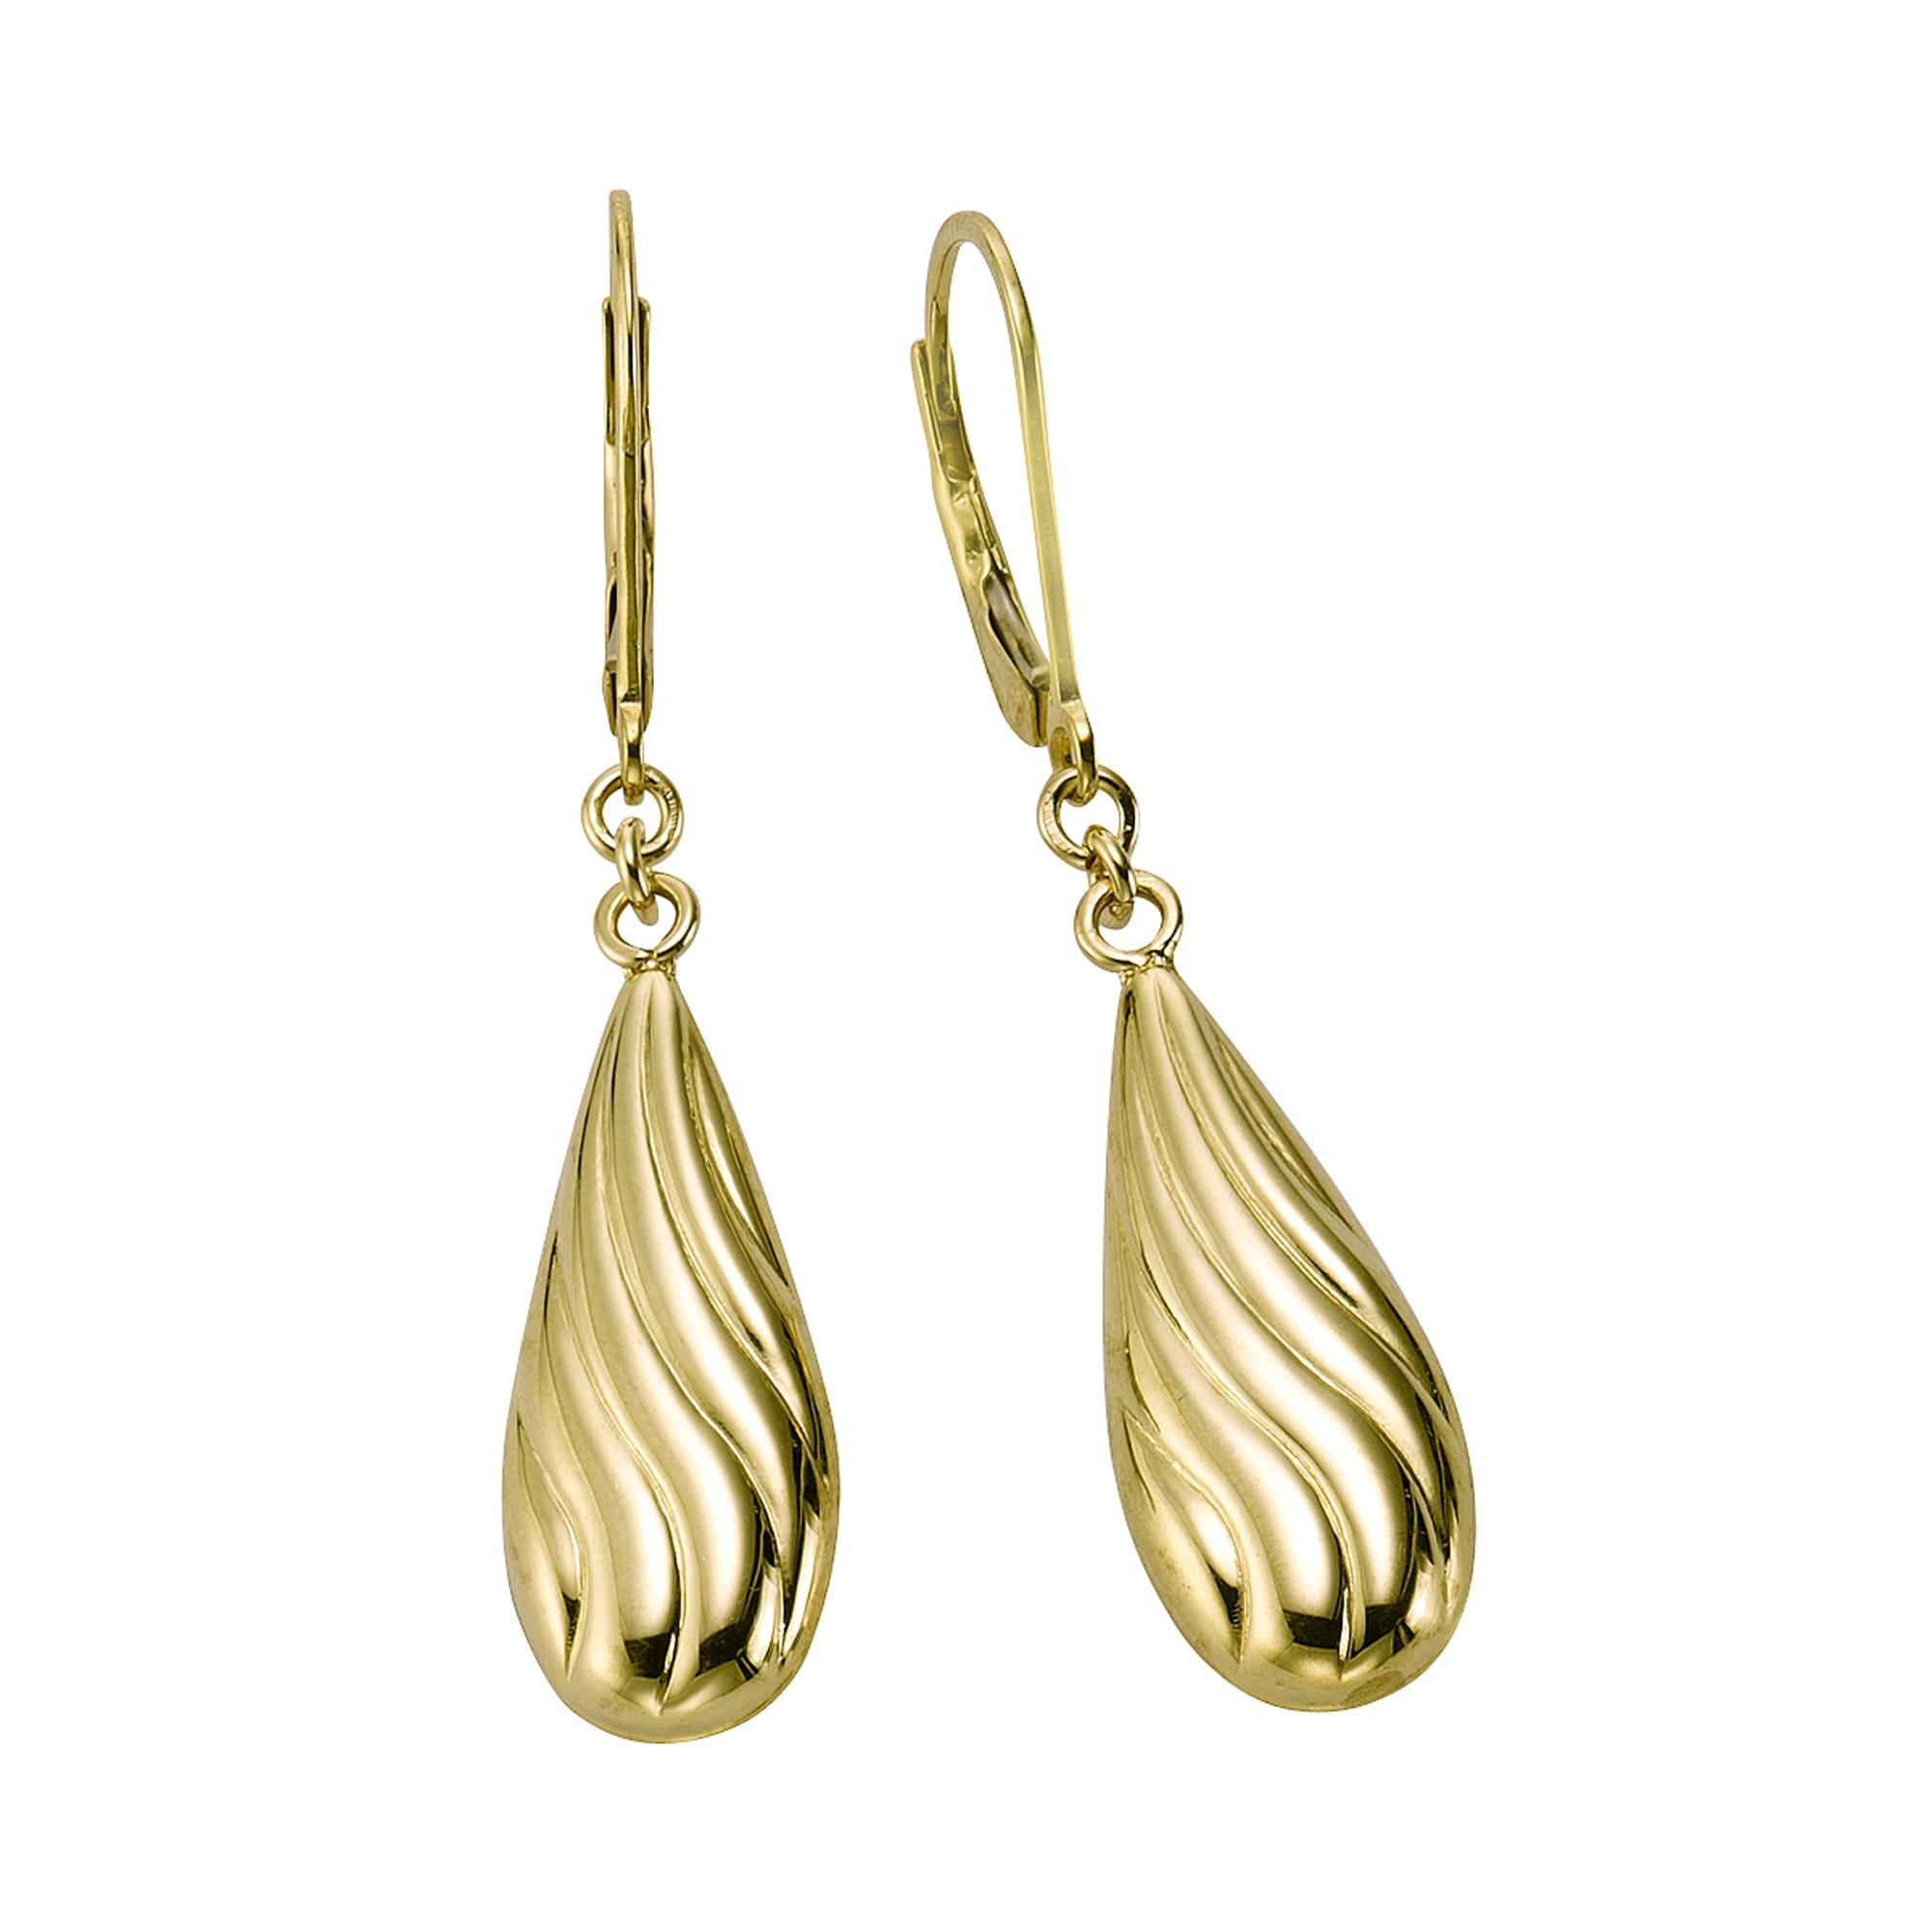 Ohrschmuck Ohrhänger 375 Gelbgold diamantiert Fascination by Ellen K